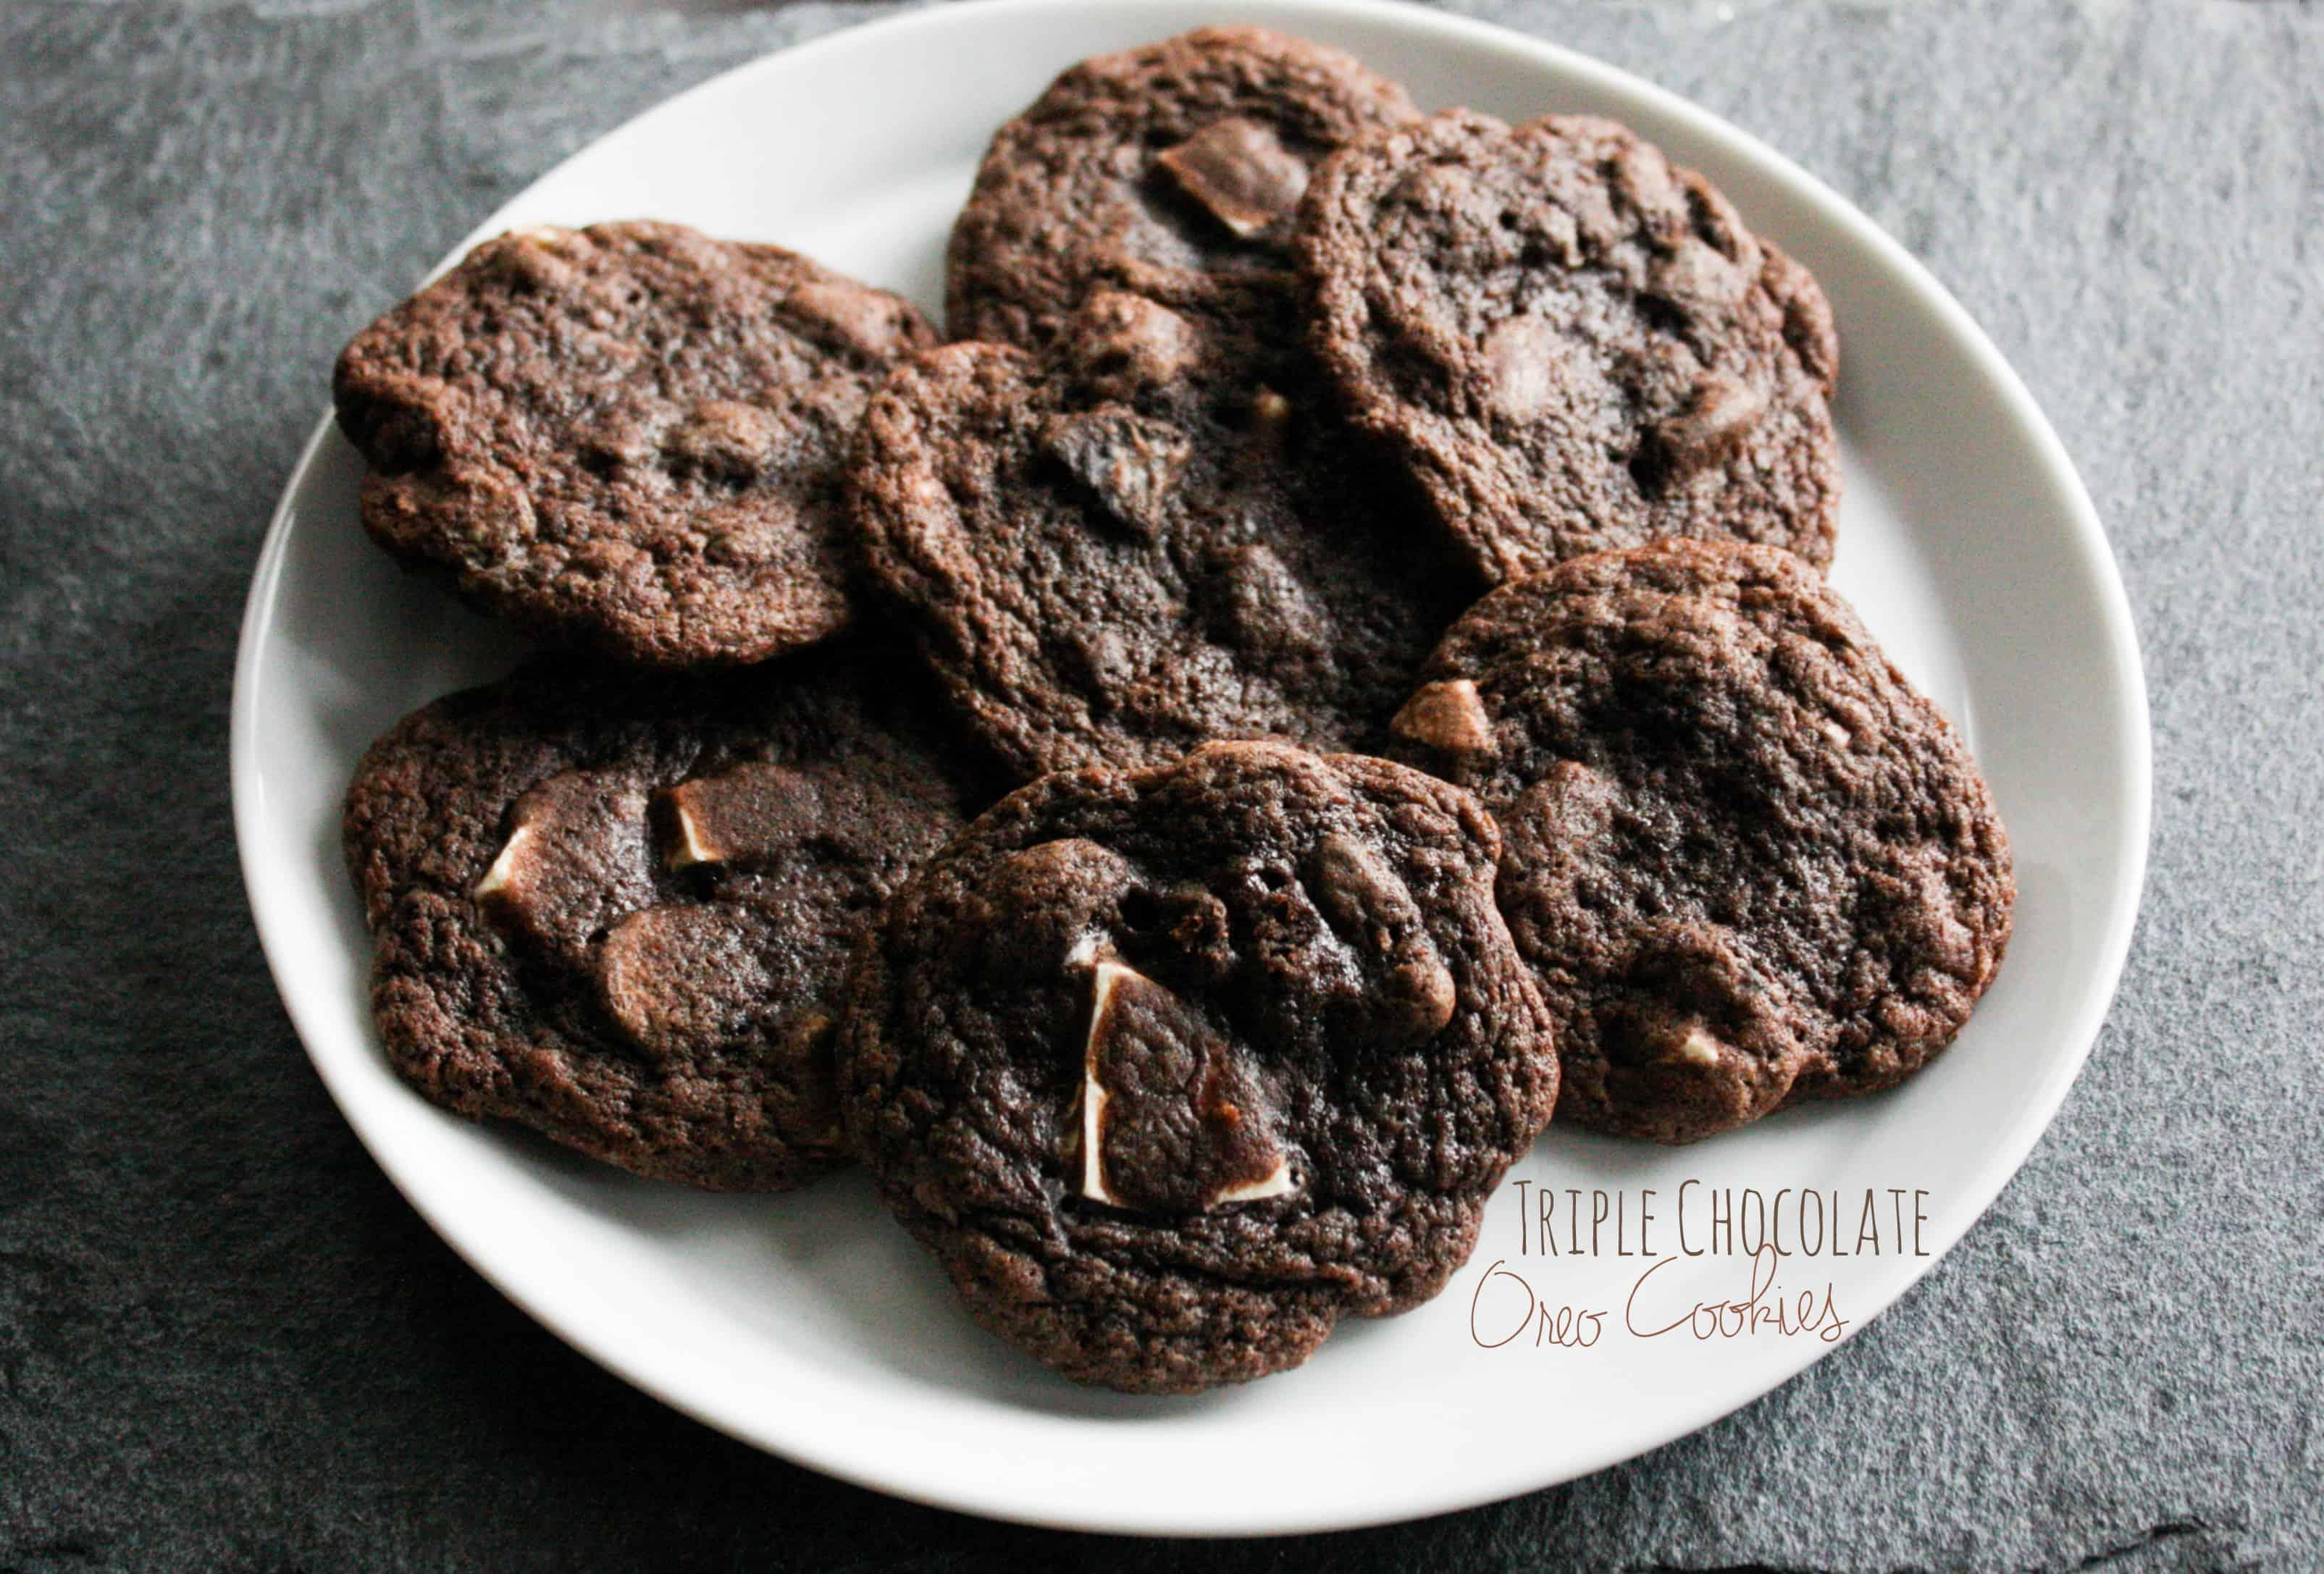 Oreo Cookie Chocolate